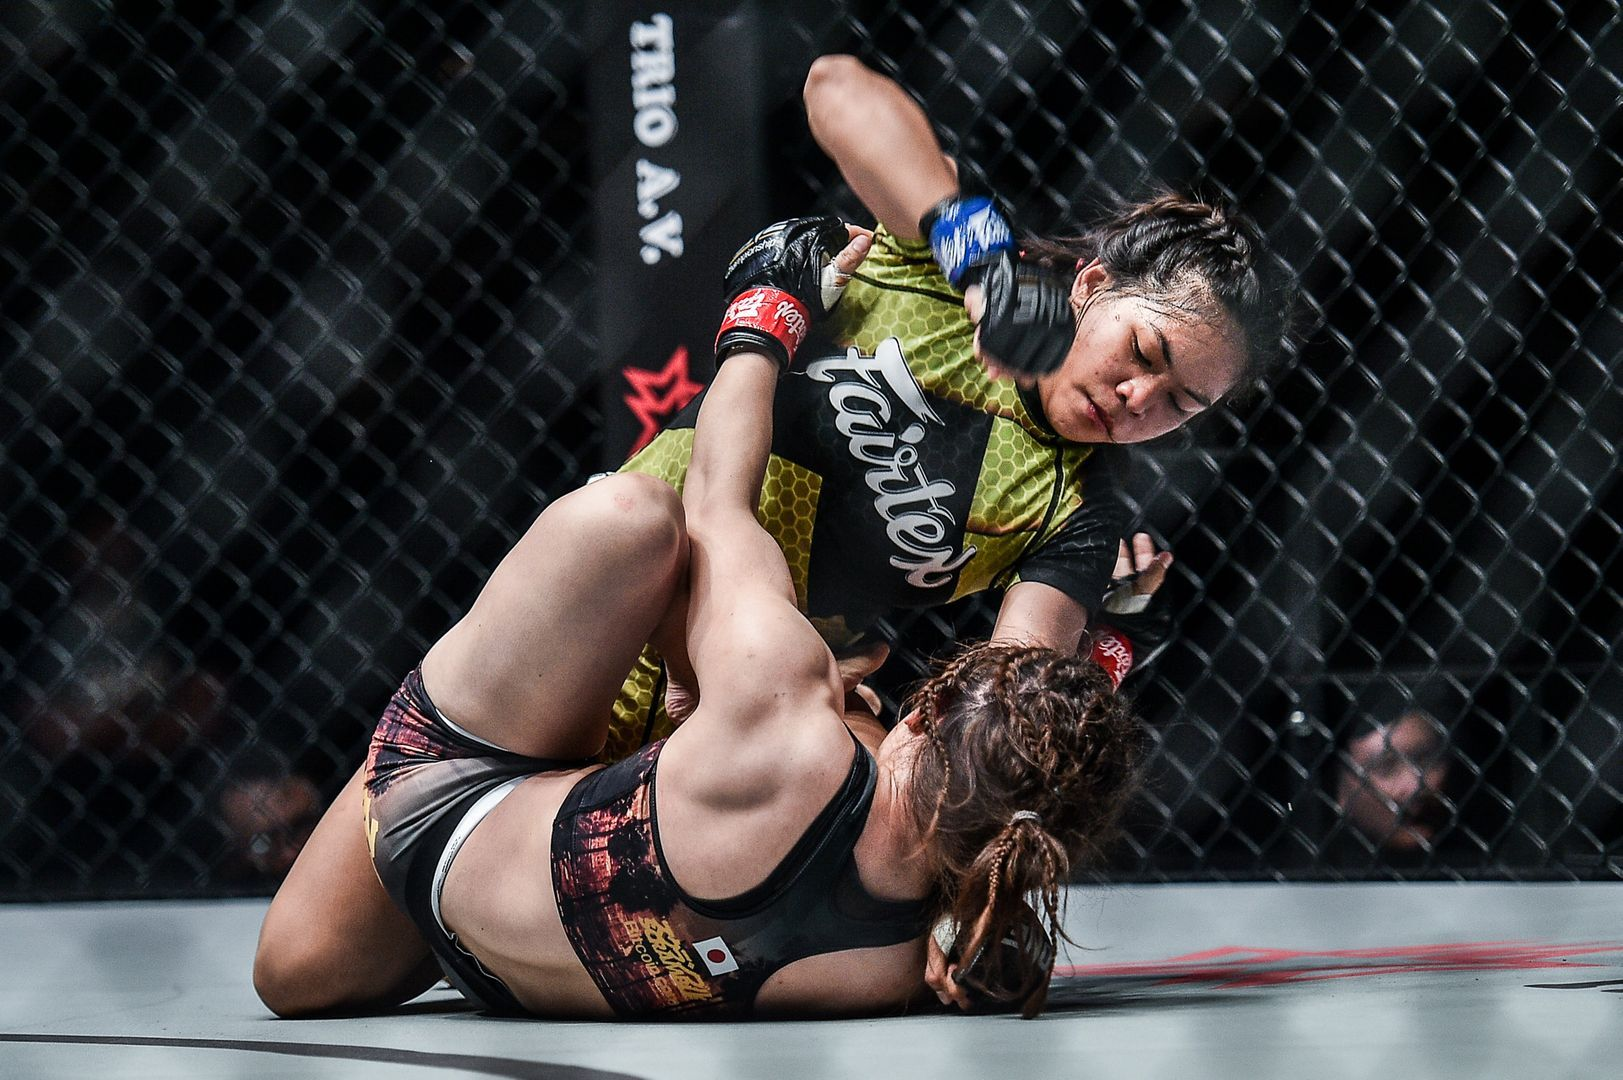 Philippine mixed martial artist Denice Zamboanga rains down ground and pound